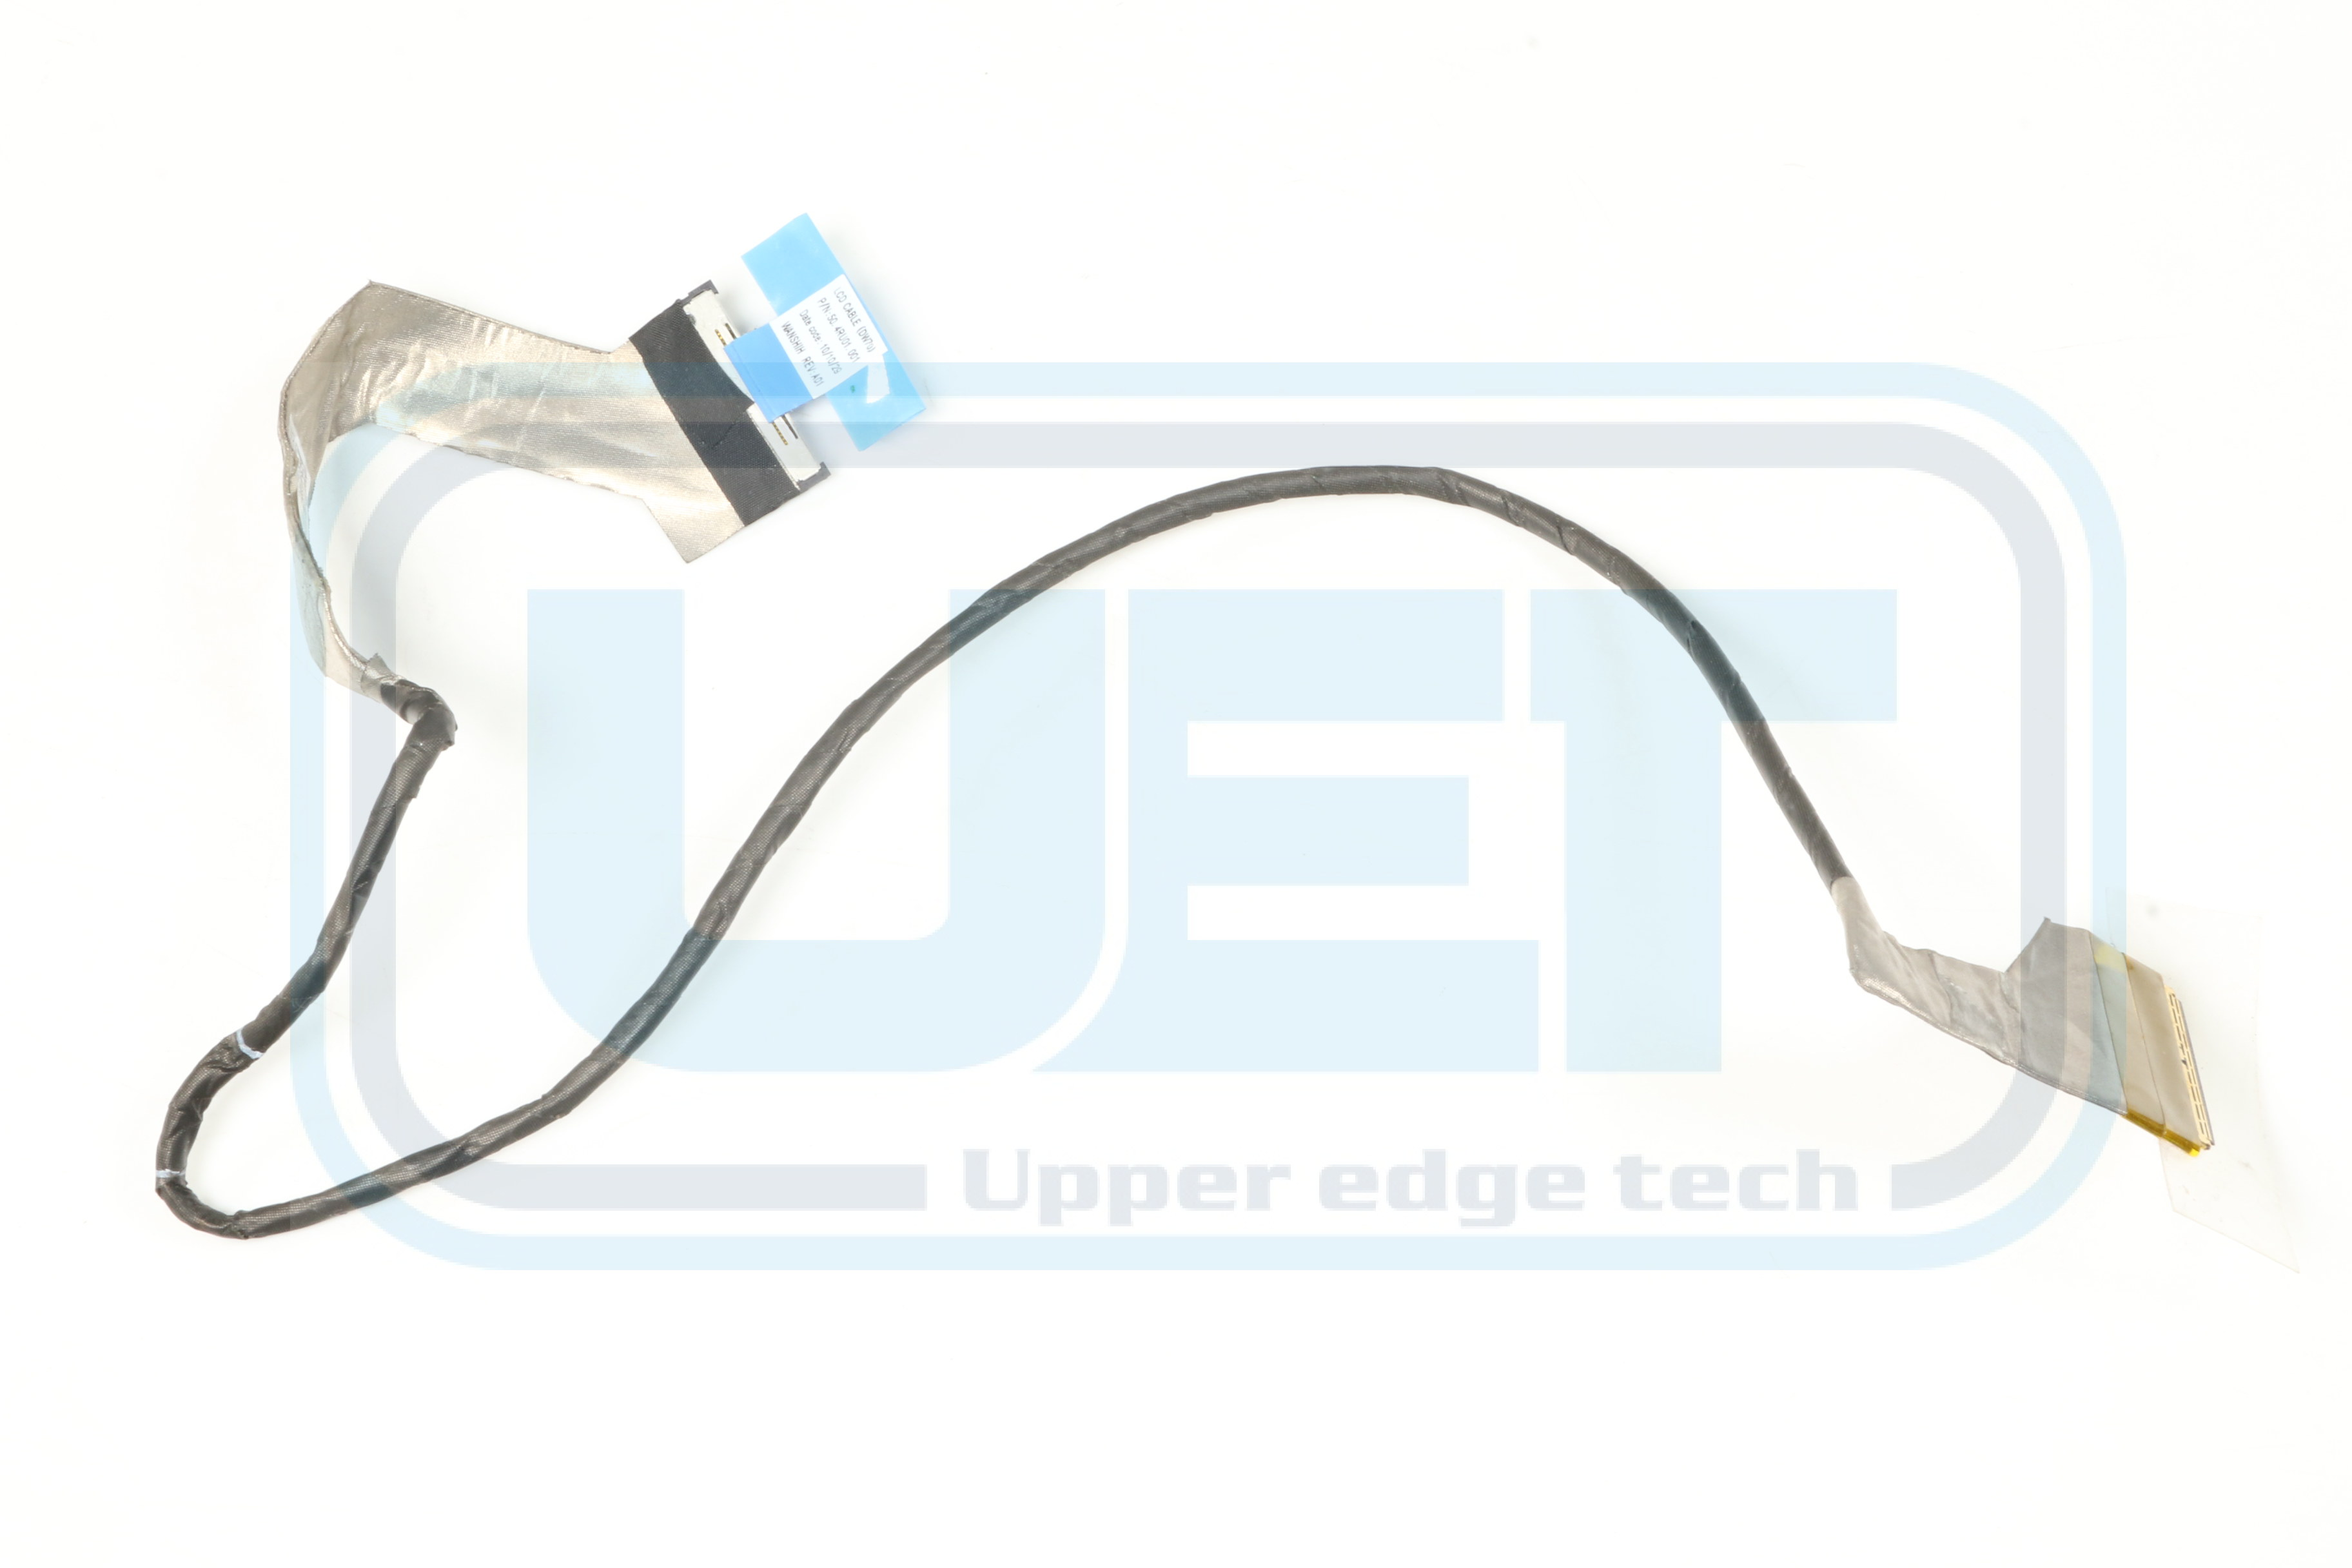 OLED /& QLED 4K HDTV JCSKY 32-70In Blue Light TV Screen Protector LED Anti Blue Light Eye Protection Filter Film Reduce Eye Fatigue and Eye Strain for LCD